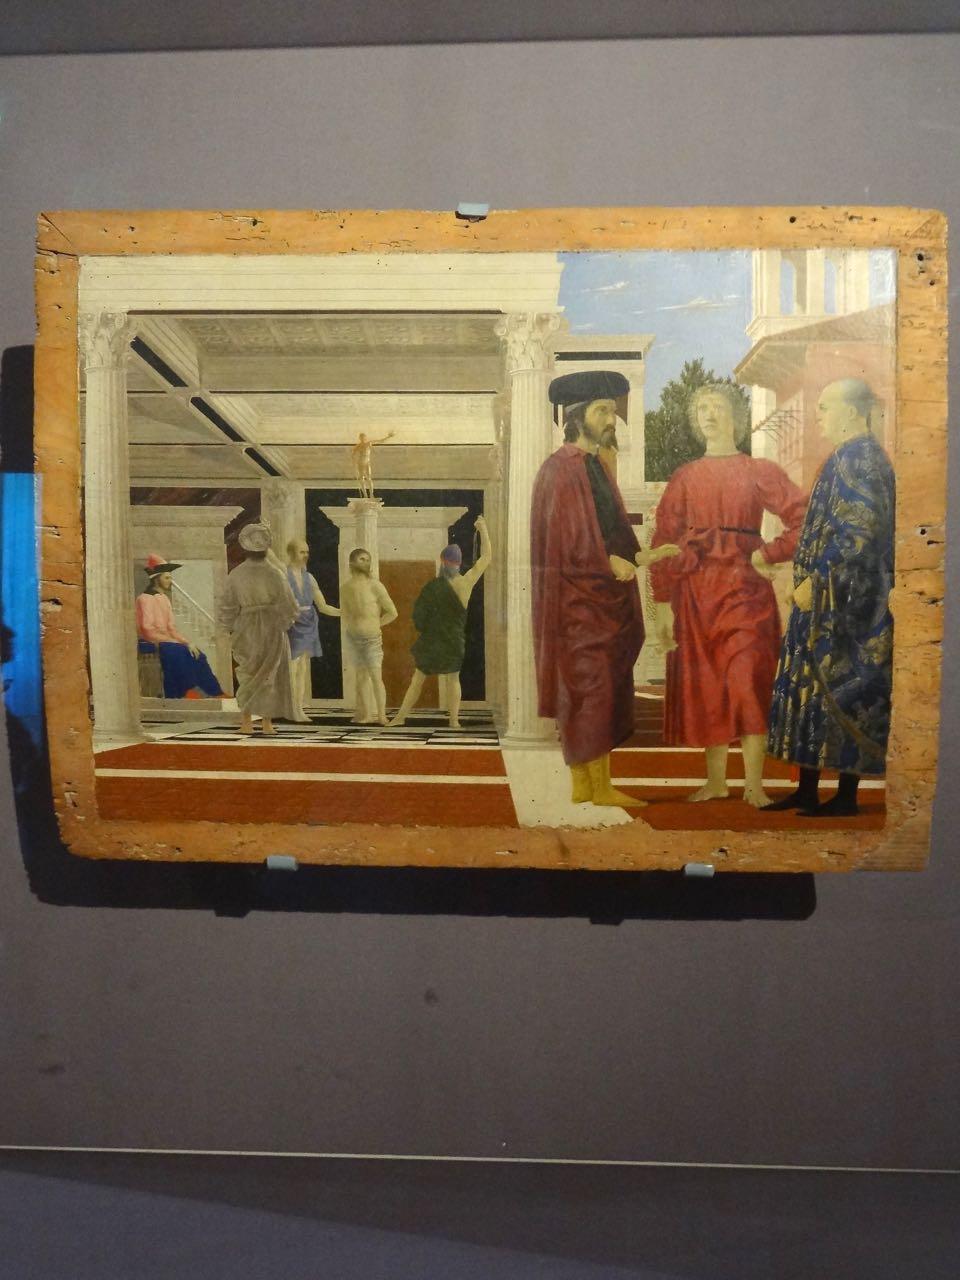 Scrumpdillyicious: Majestic Urbino: The Cradle of the ...